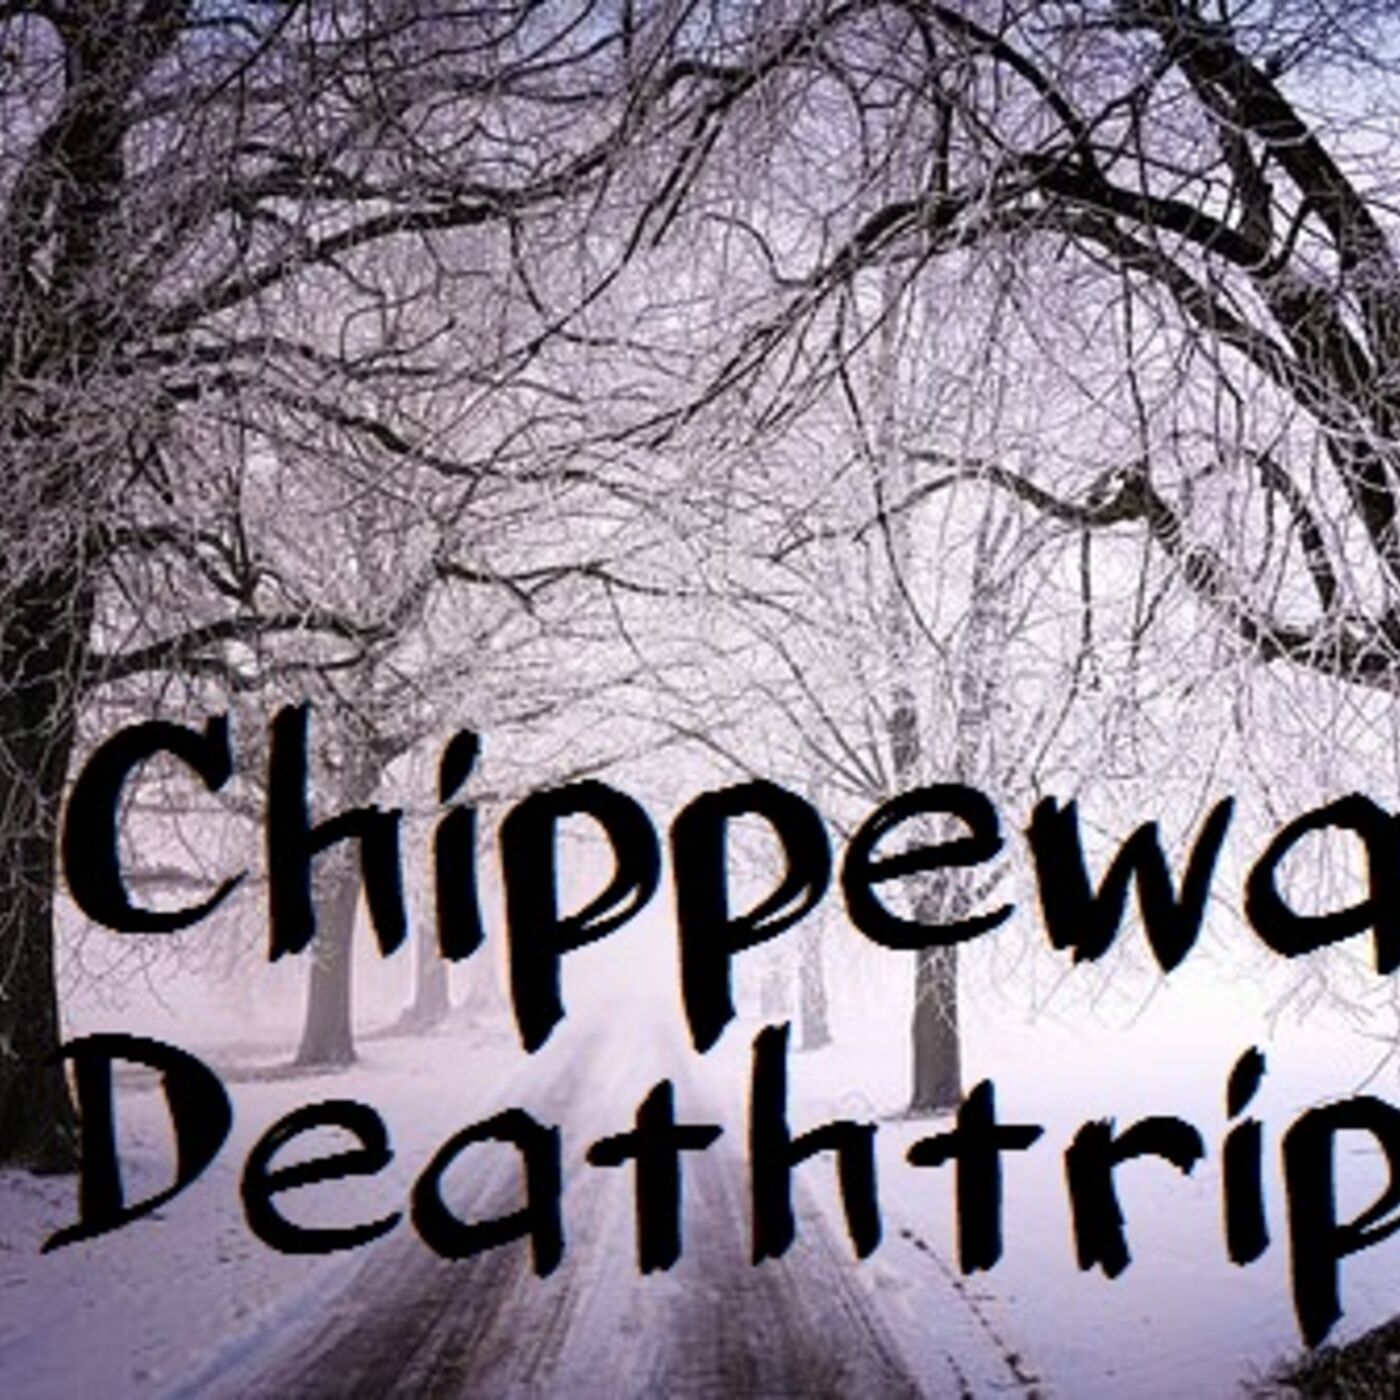 Chippewa Deathtrip